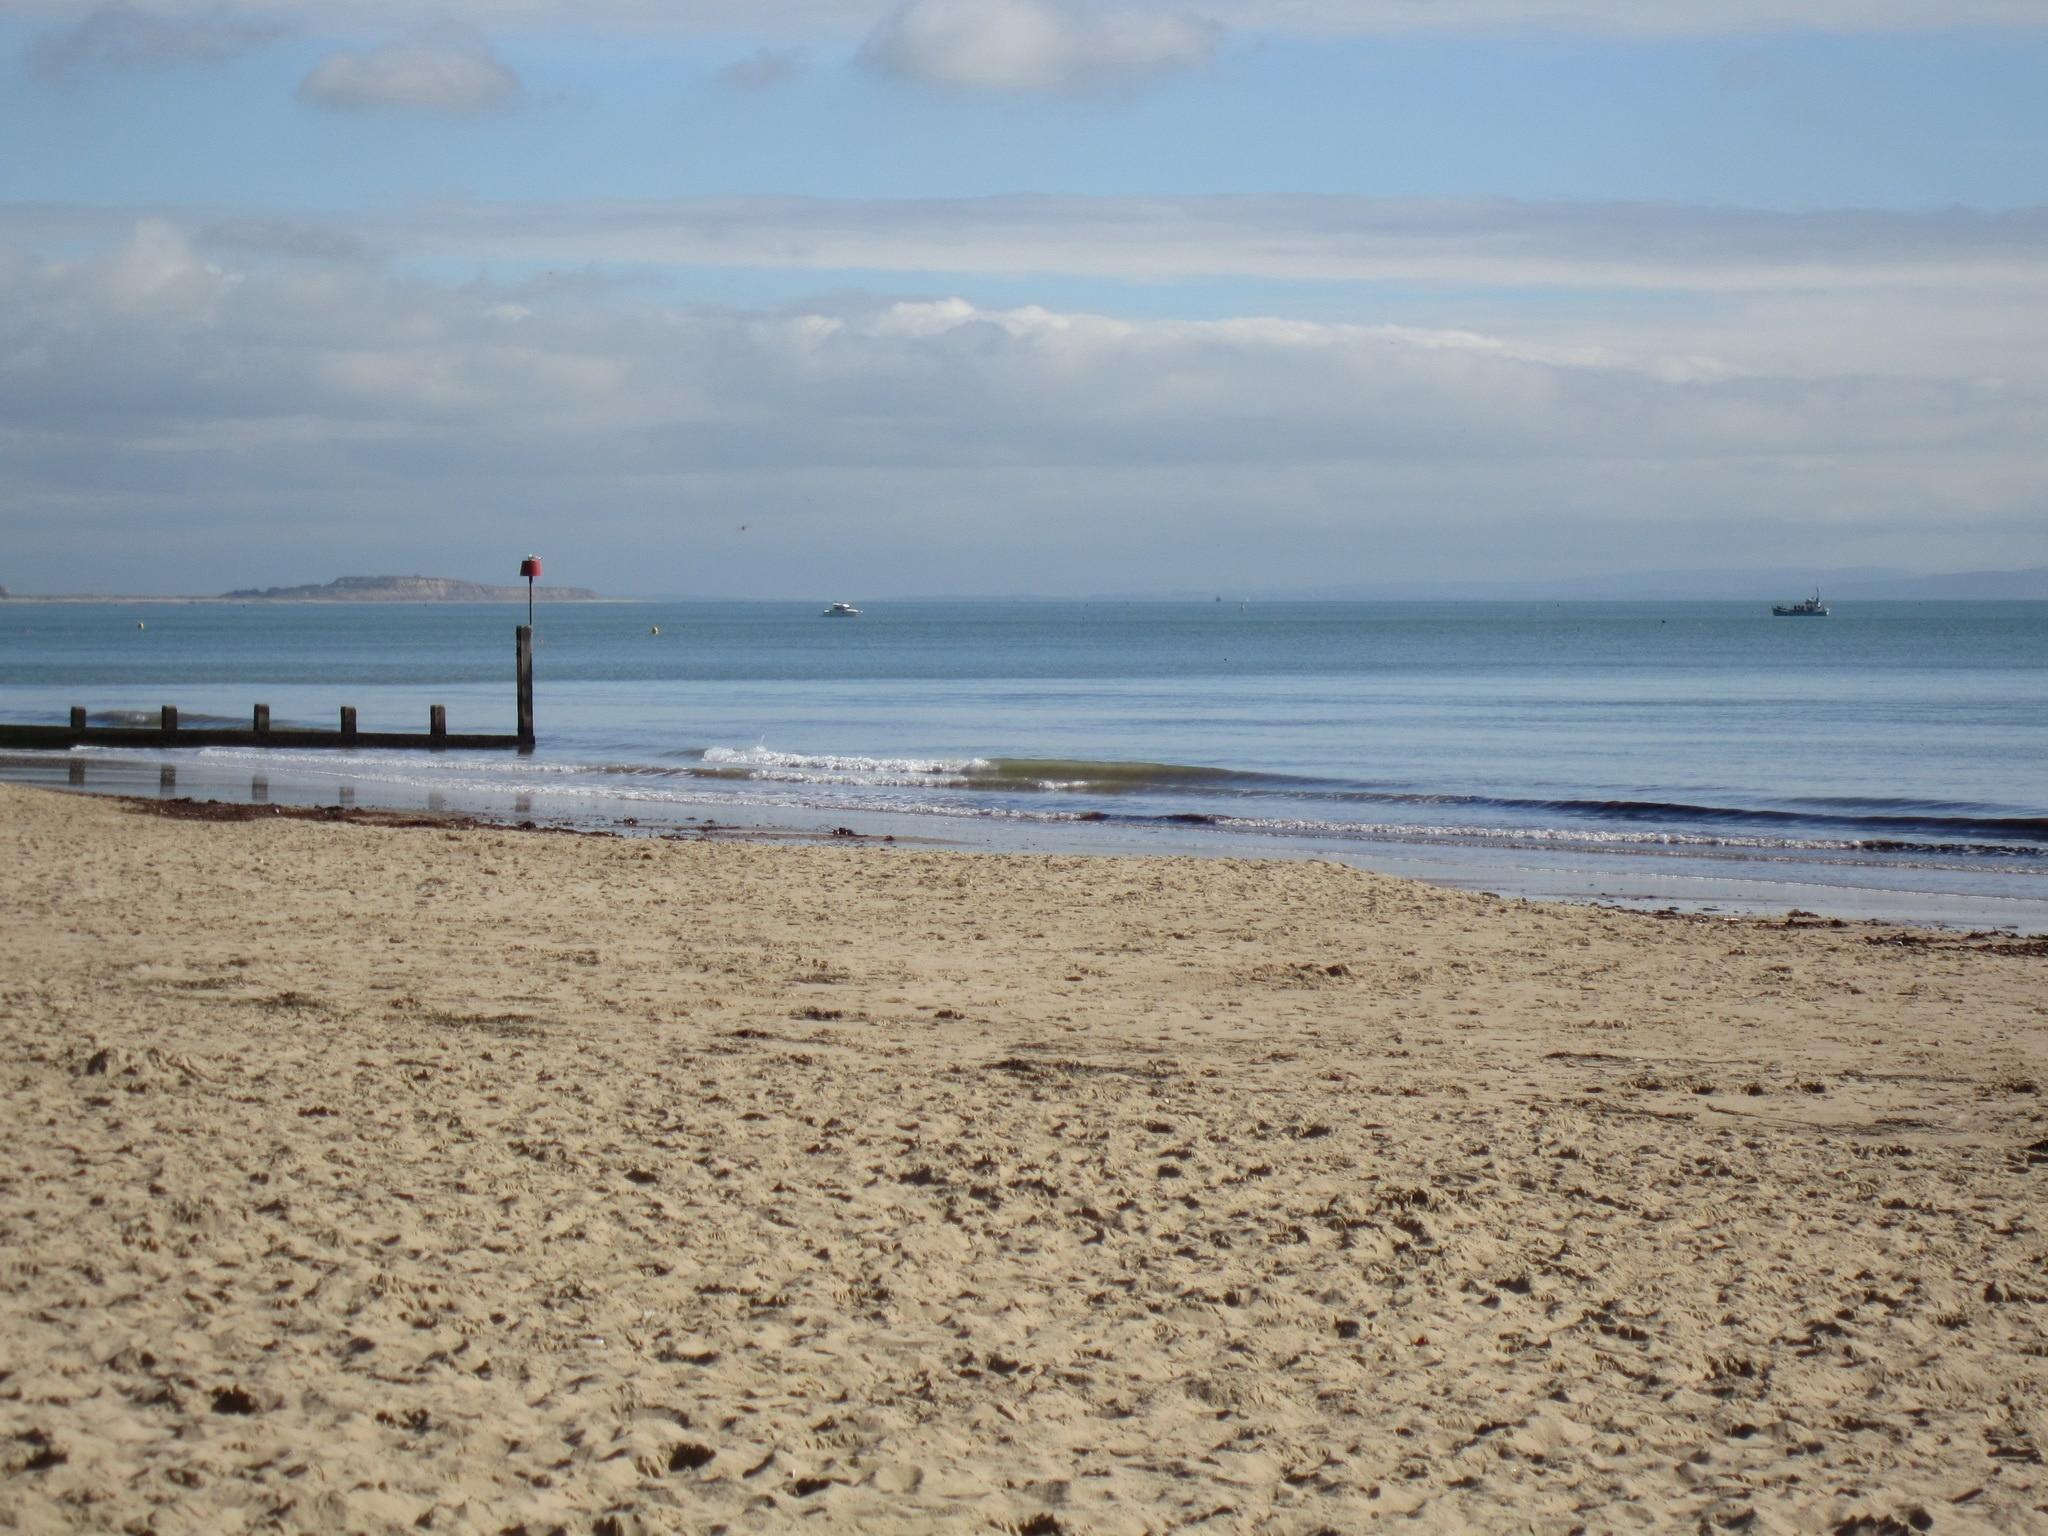 Alum Chine Beach, Bournemouth, England, United Kingdom